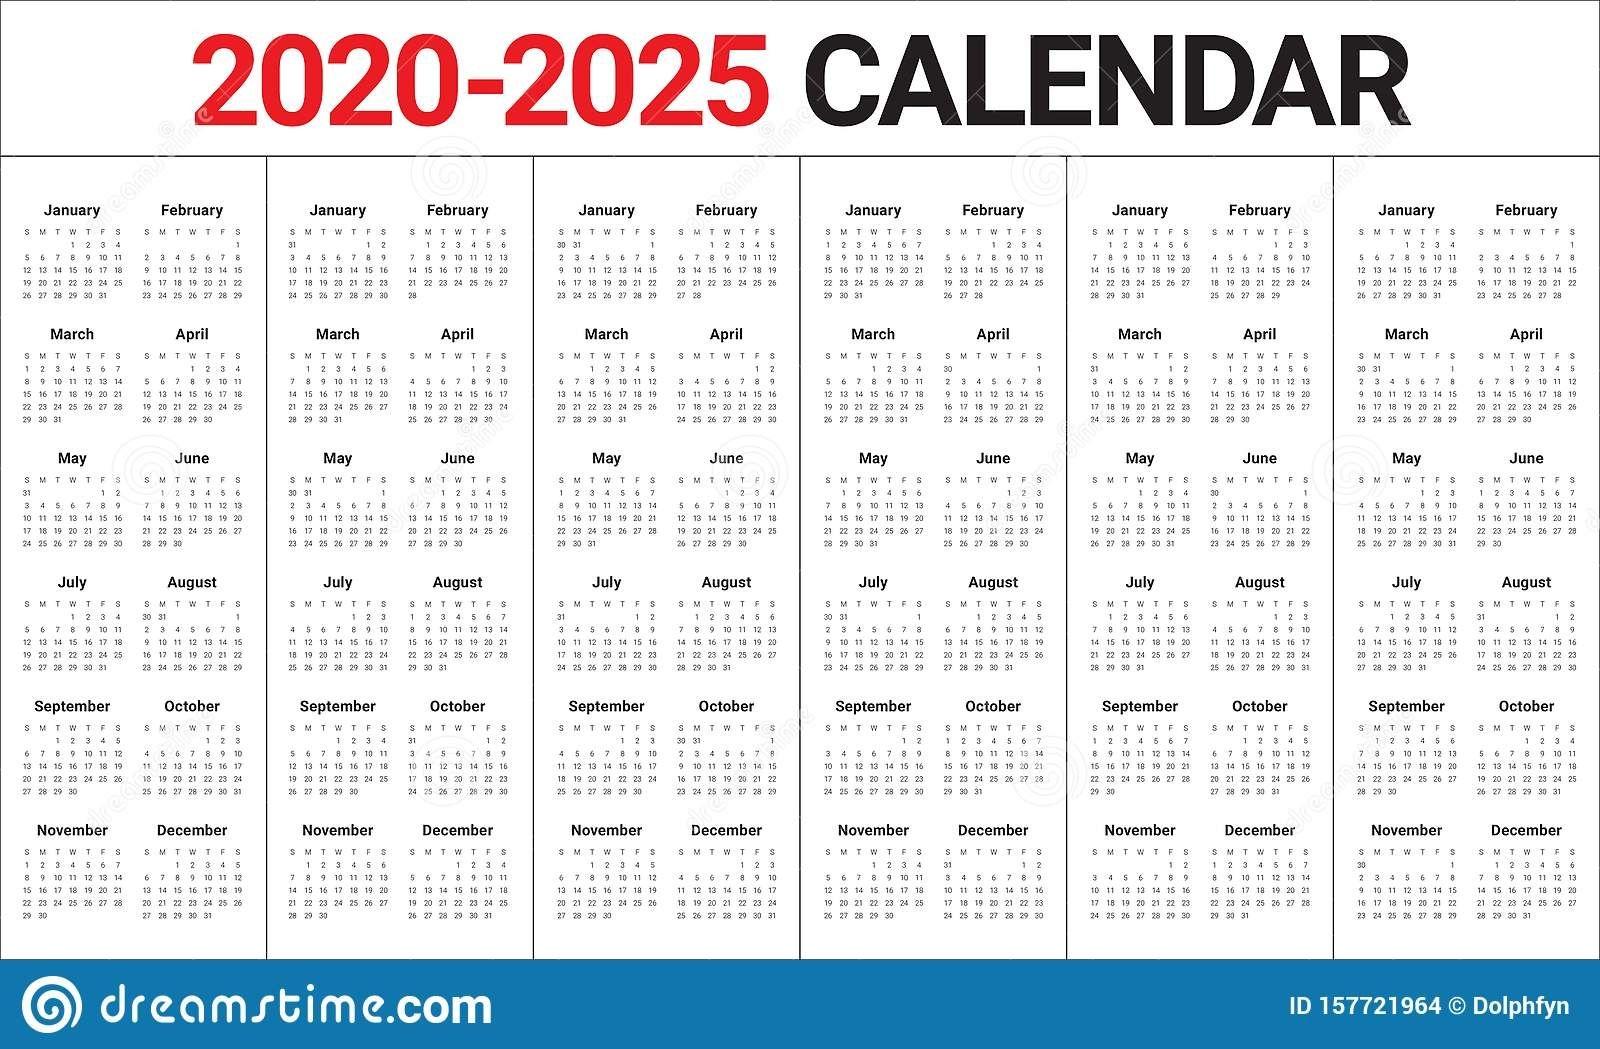 year 2020 2021 2022 2023 2024 2025 calendar vector design